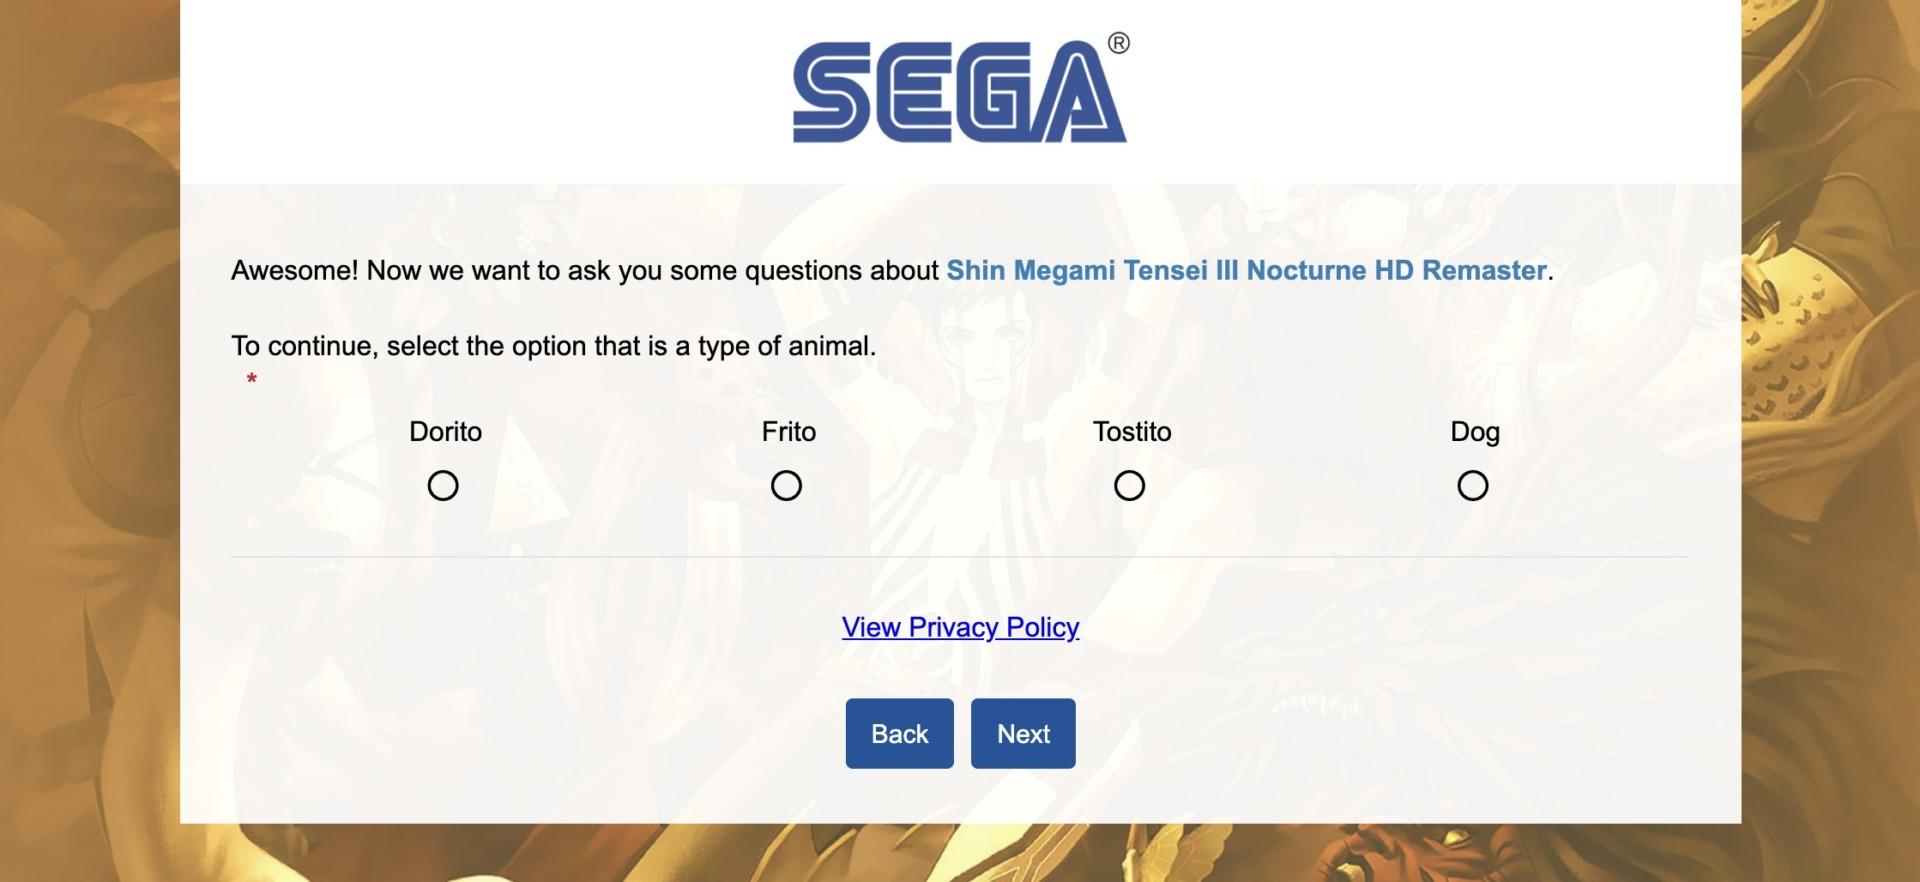 SMT III Nocturne HD Remaster Atlus Survey